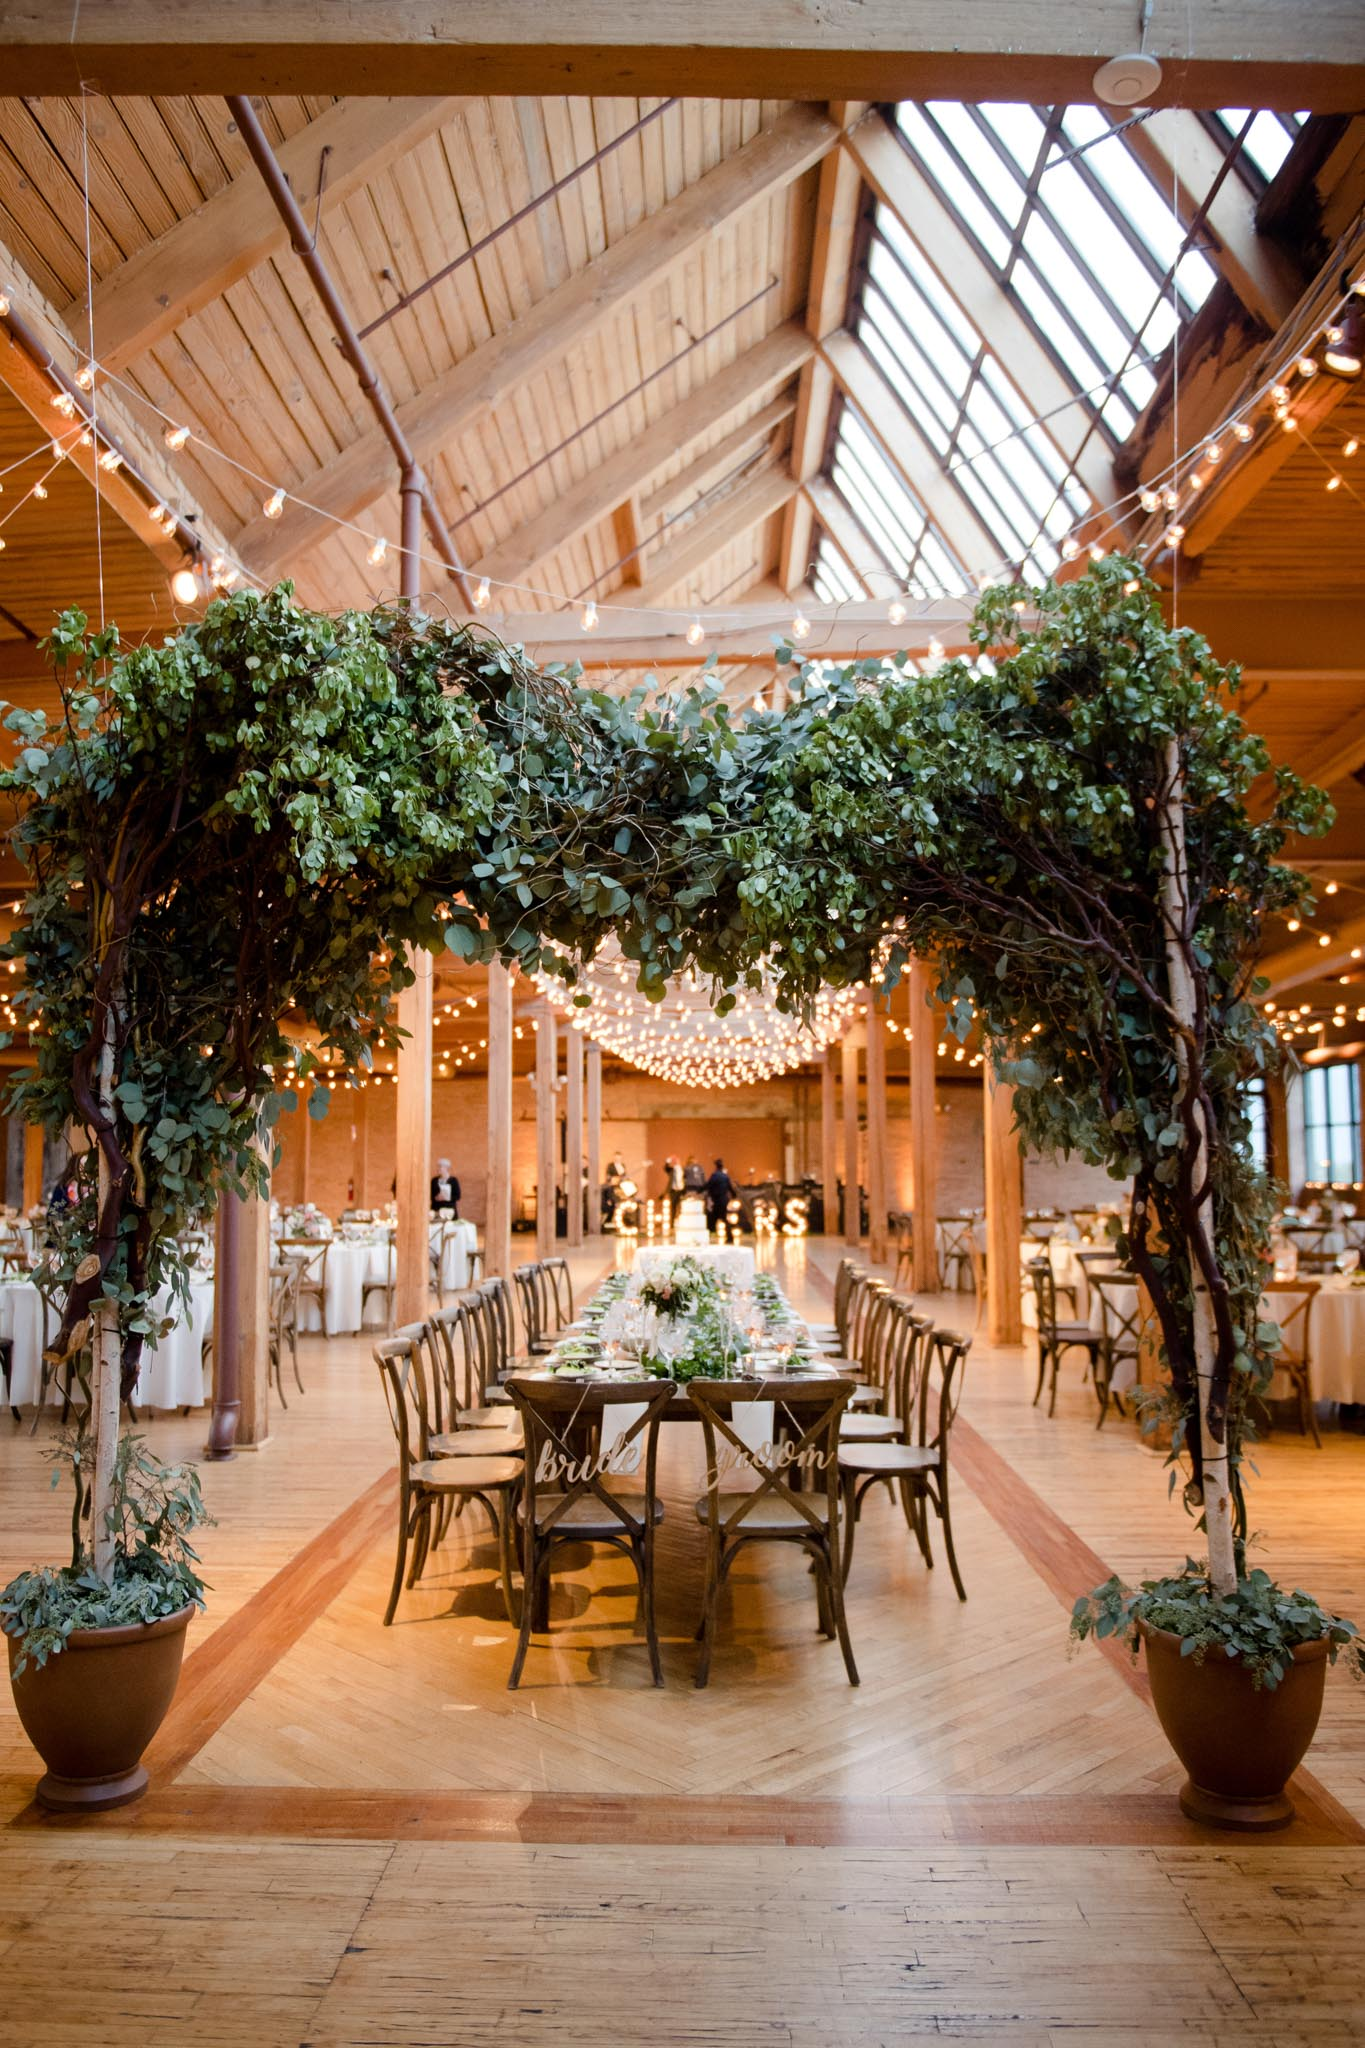 bridgeport-art-center-wedding-photos-31.jpg